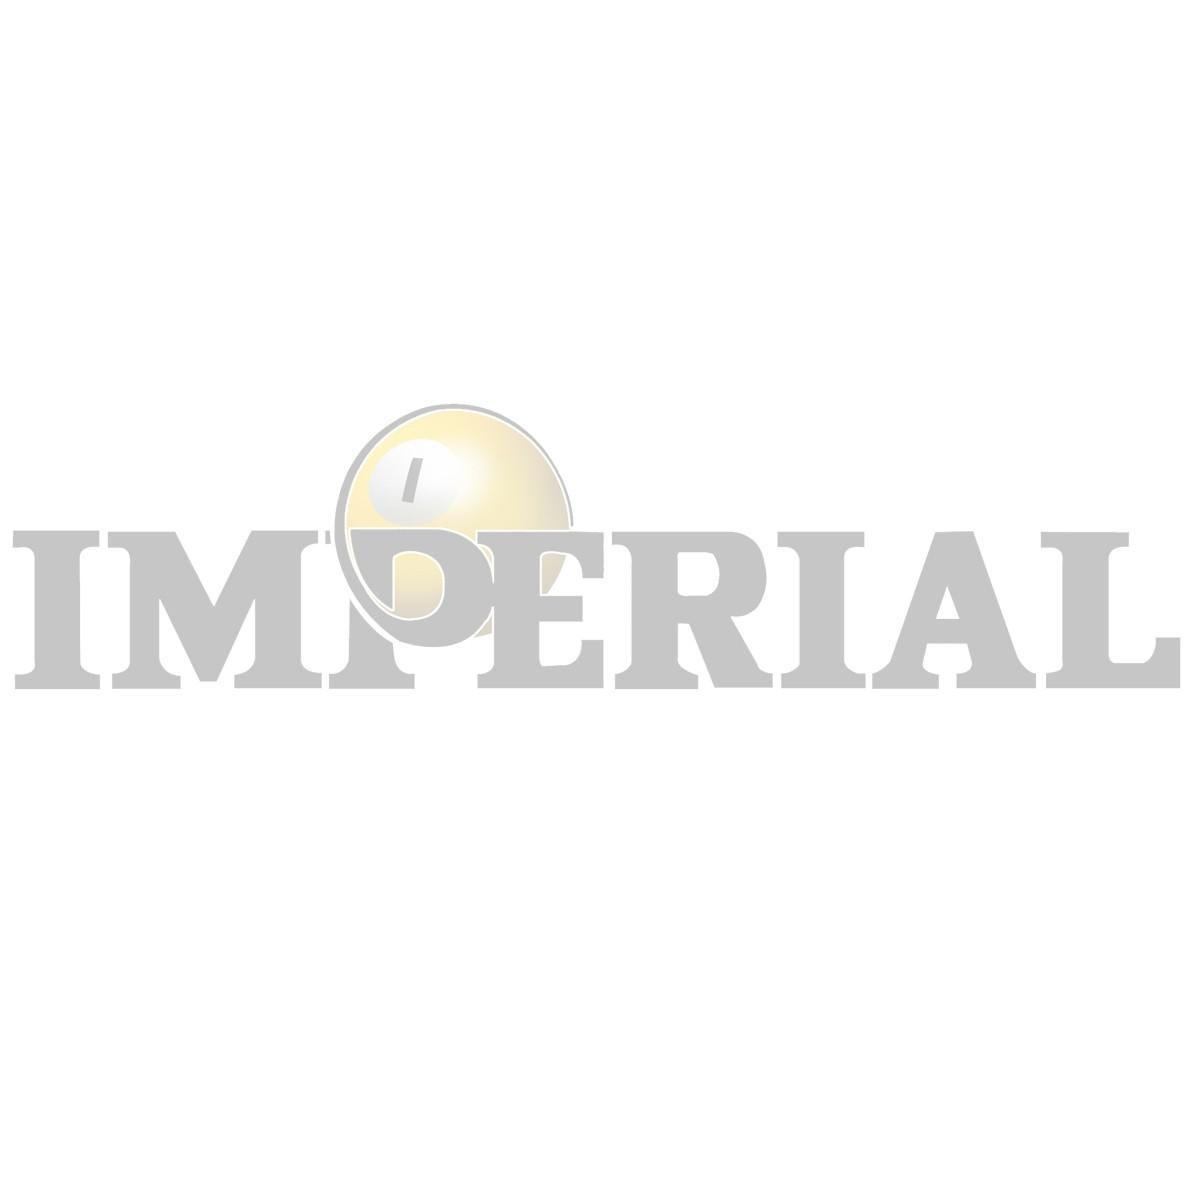 Baltimore Ravens 9-foot Billiard Cloth